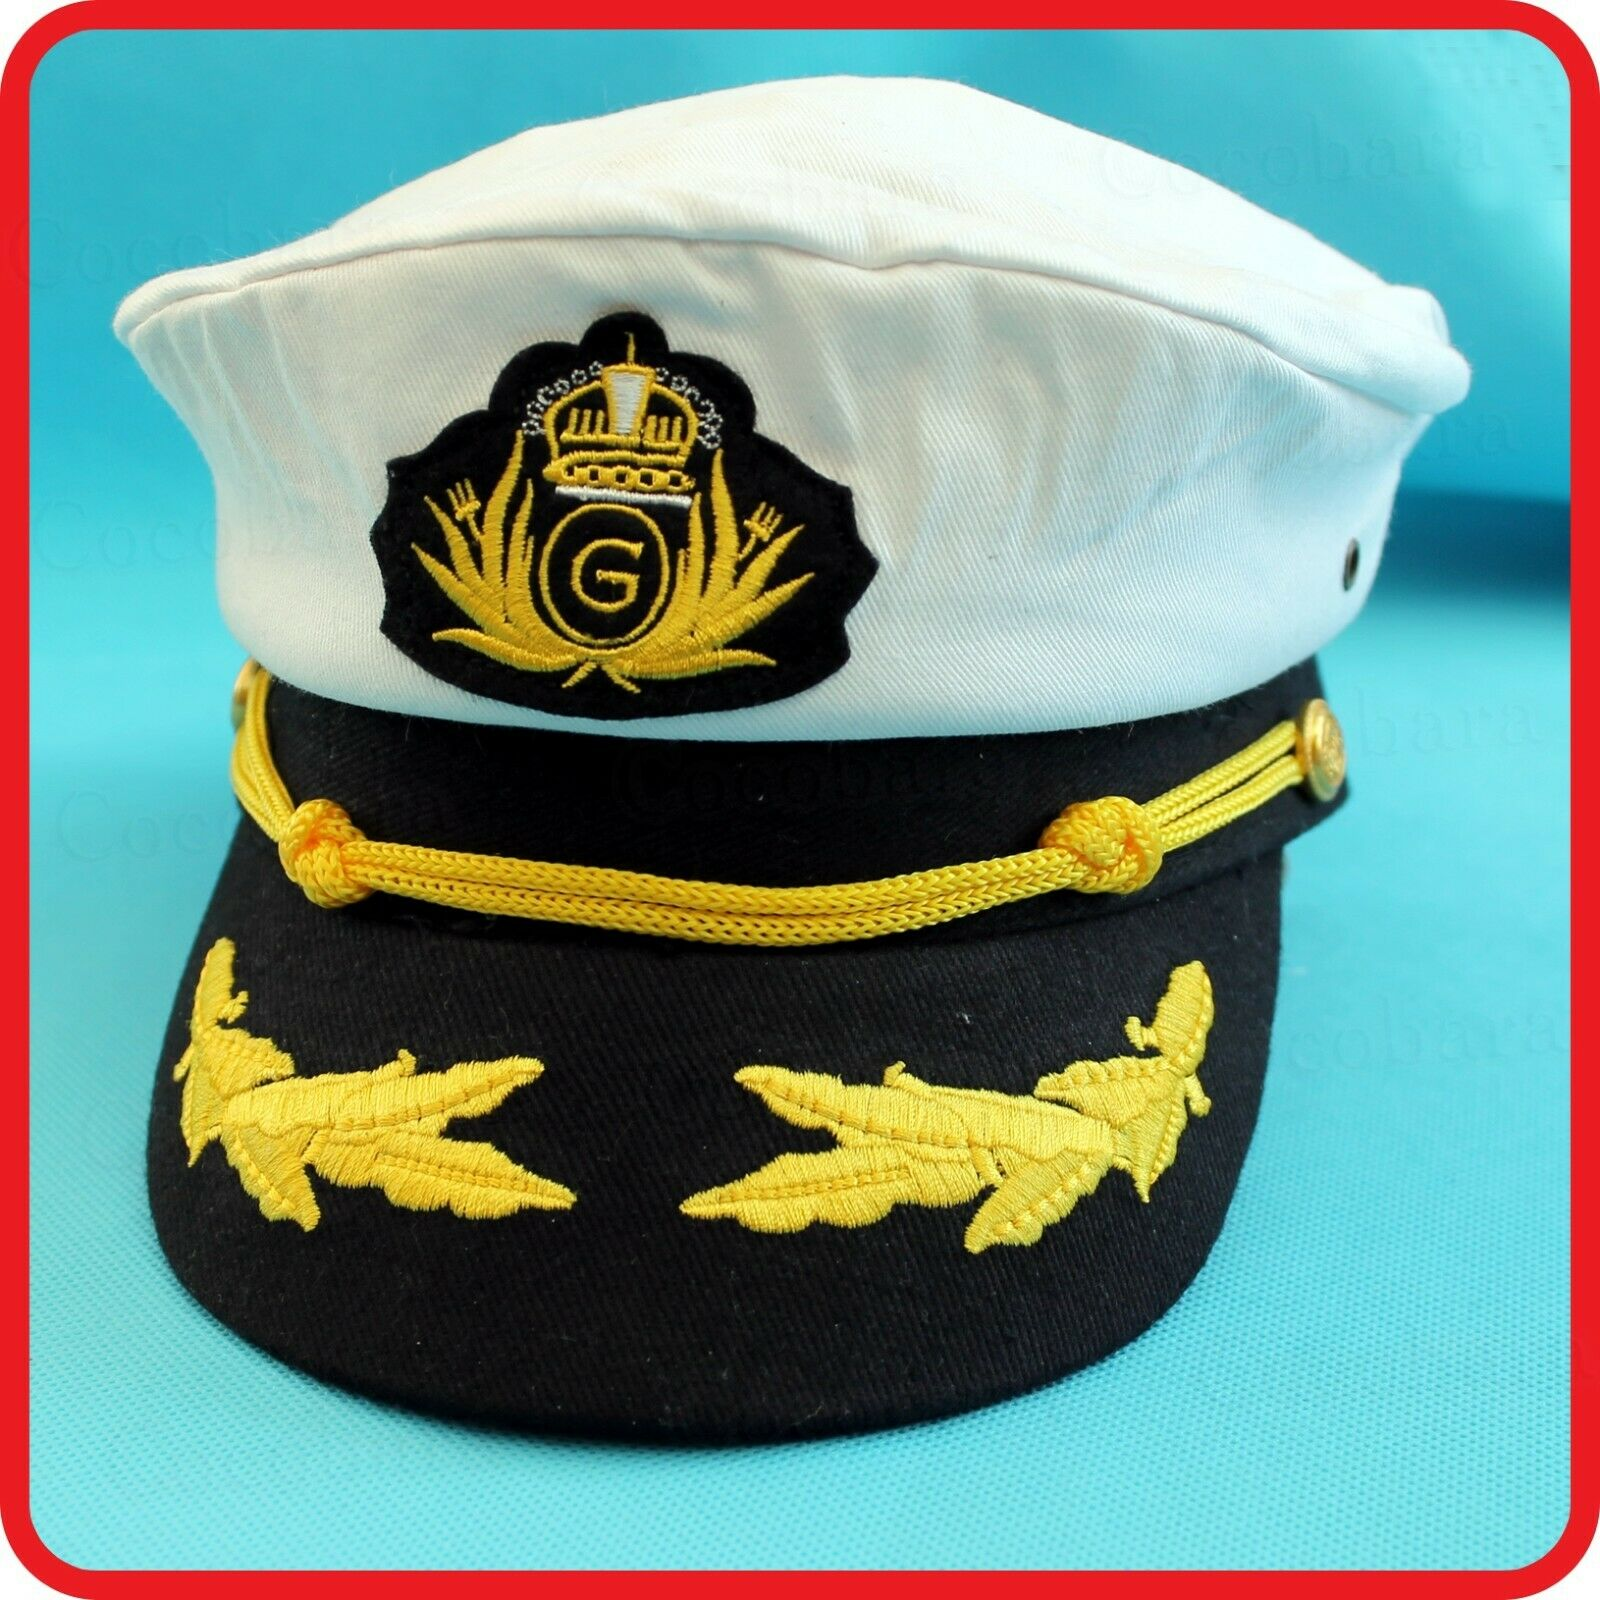 CHILDREN / ADULTS WHITE CAPTAIN HAT G -PILOT,AIR FORCE,NAVY,YACHT,SKIPPER,SAILOR